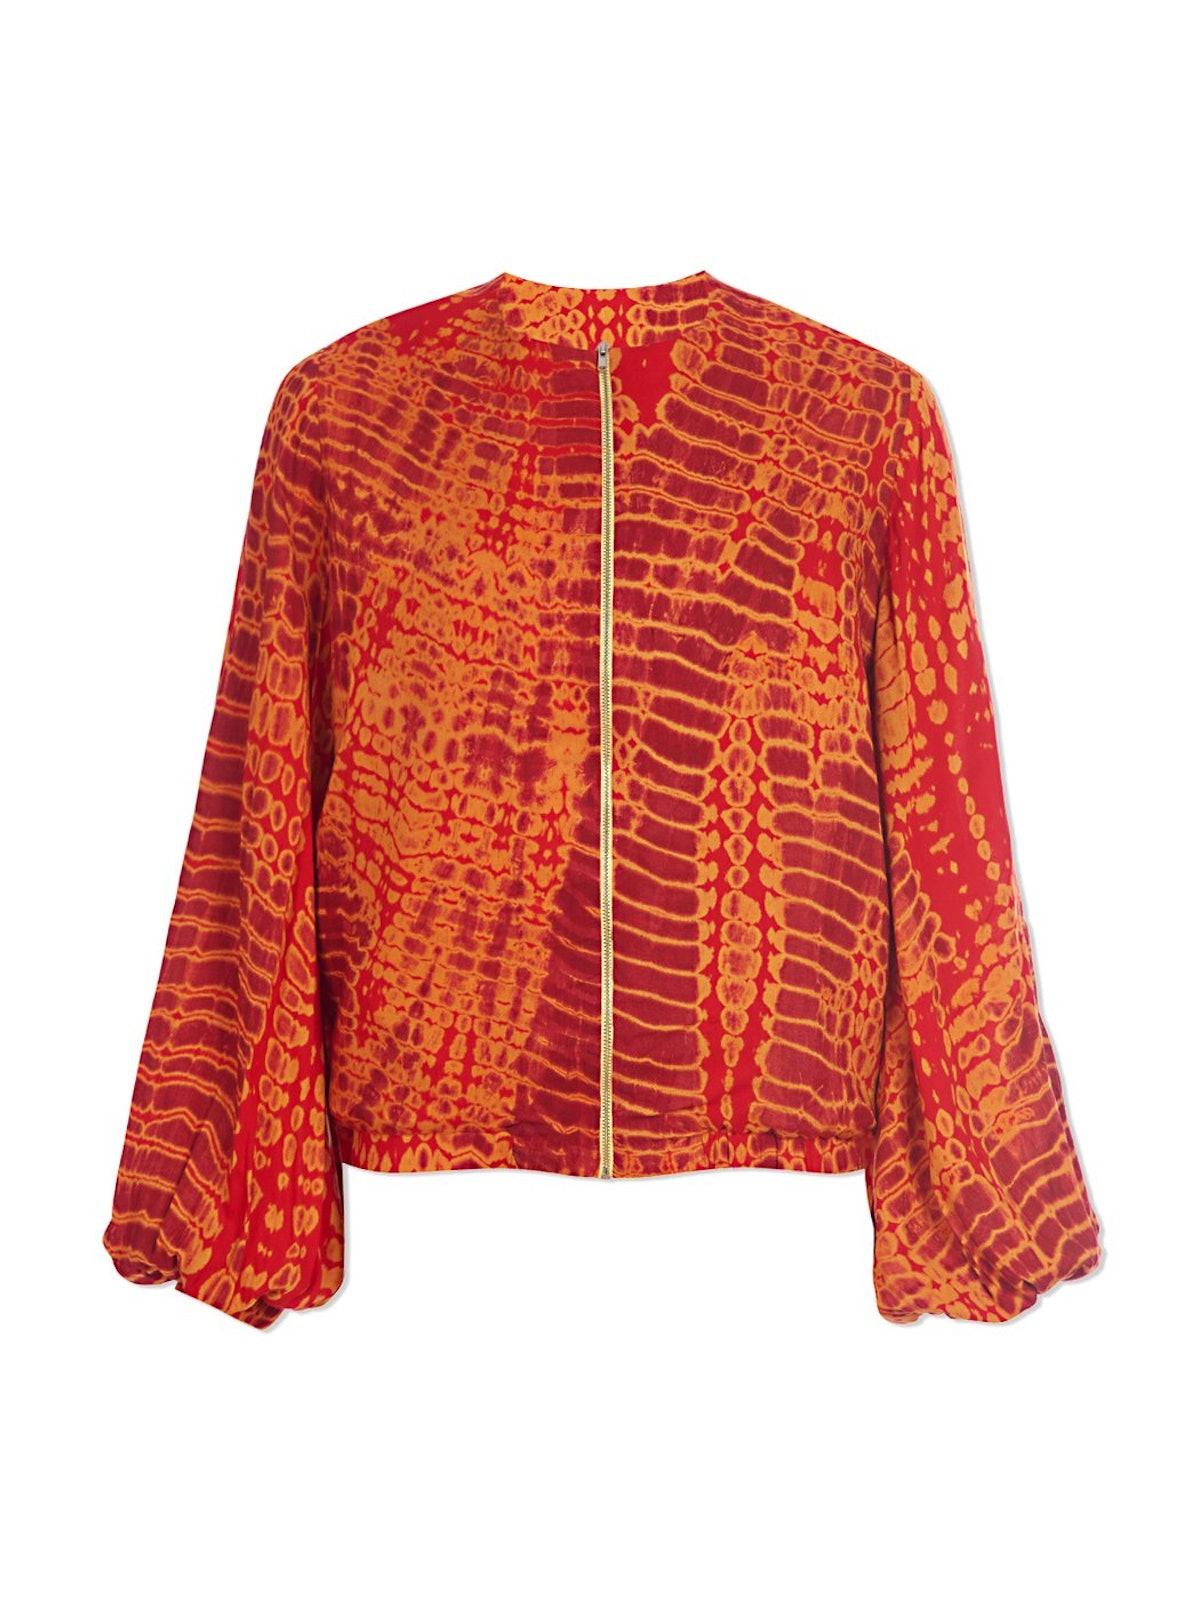 Red Tie-Dye Bomber Jacket